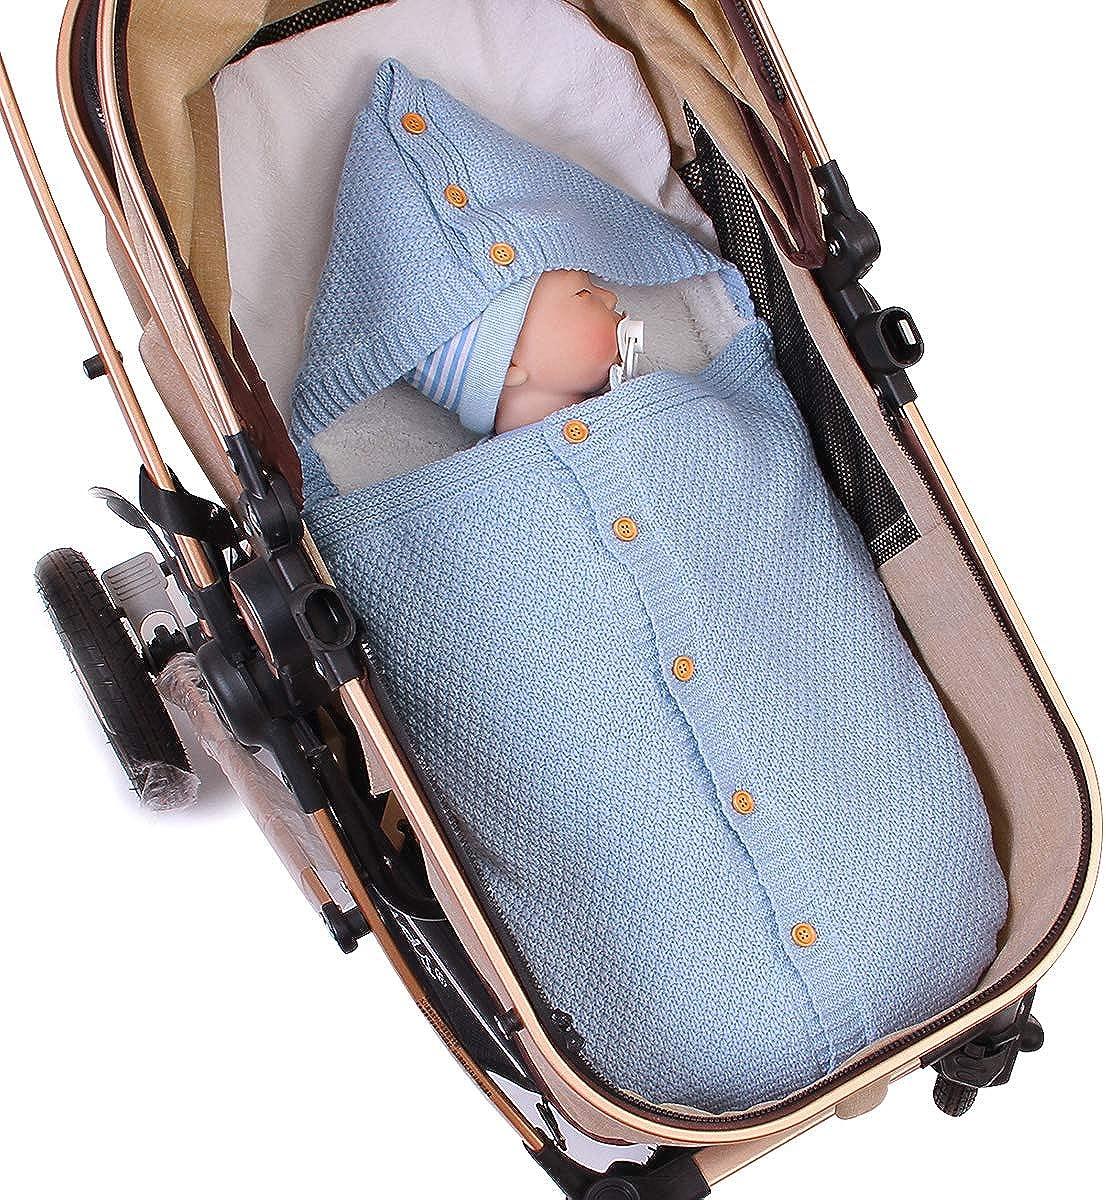 Borlai Newborn Baby Thick Warm Sleeping Bag Knit Fleece Blanket Winter Stroller Wrap for 0-12 Months